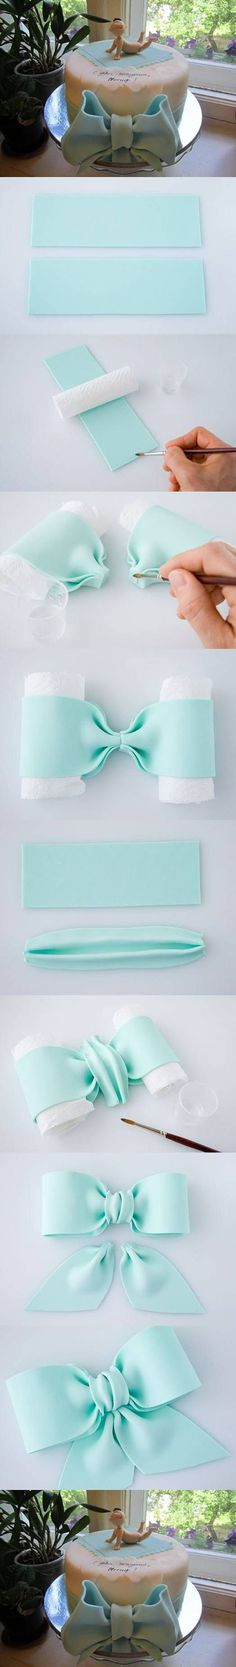 Beautiful Blue Bow | DIY & Crafts Tutorials